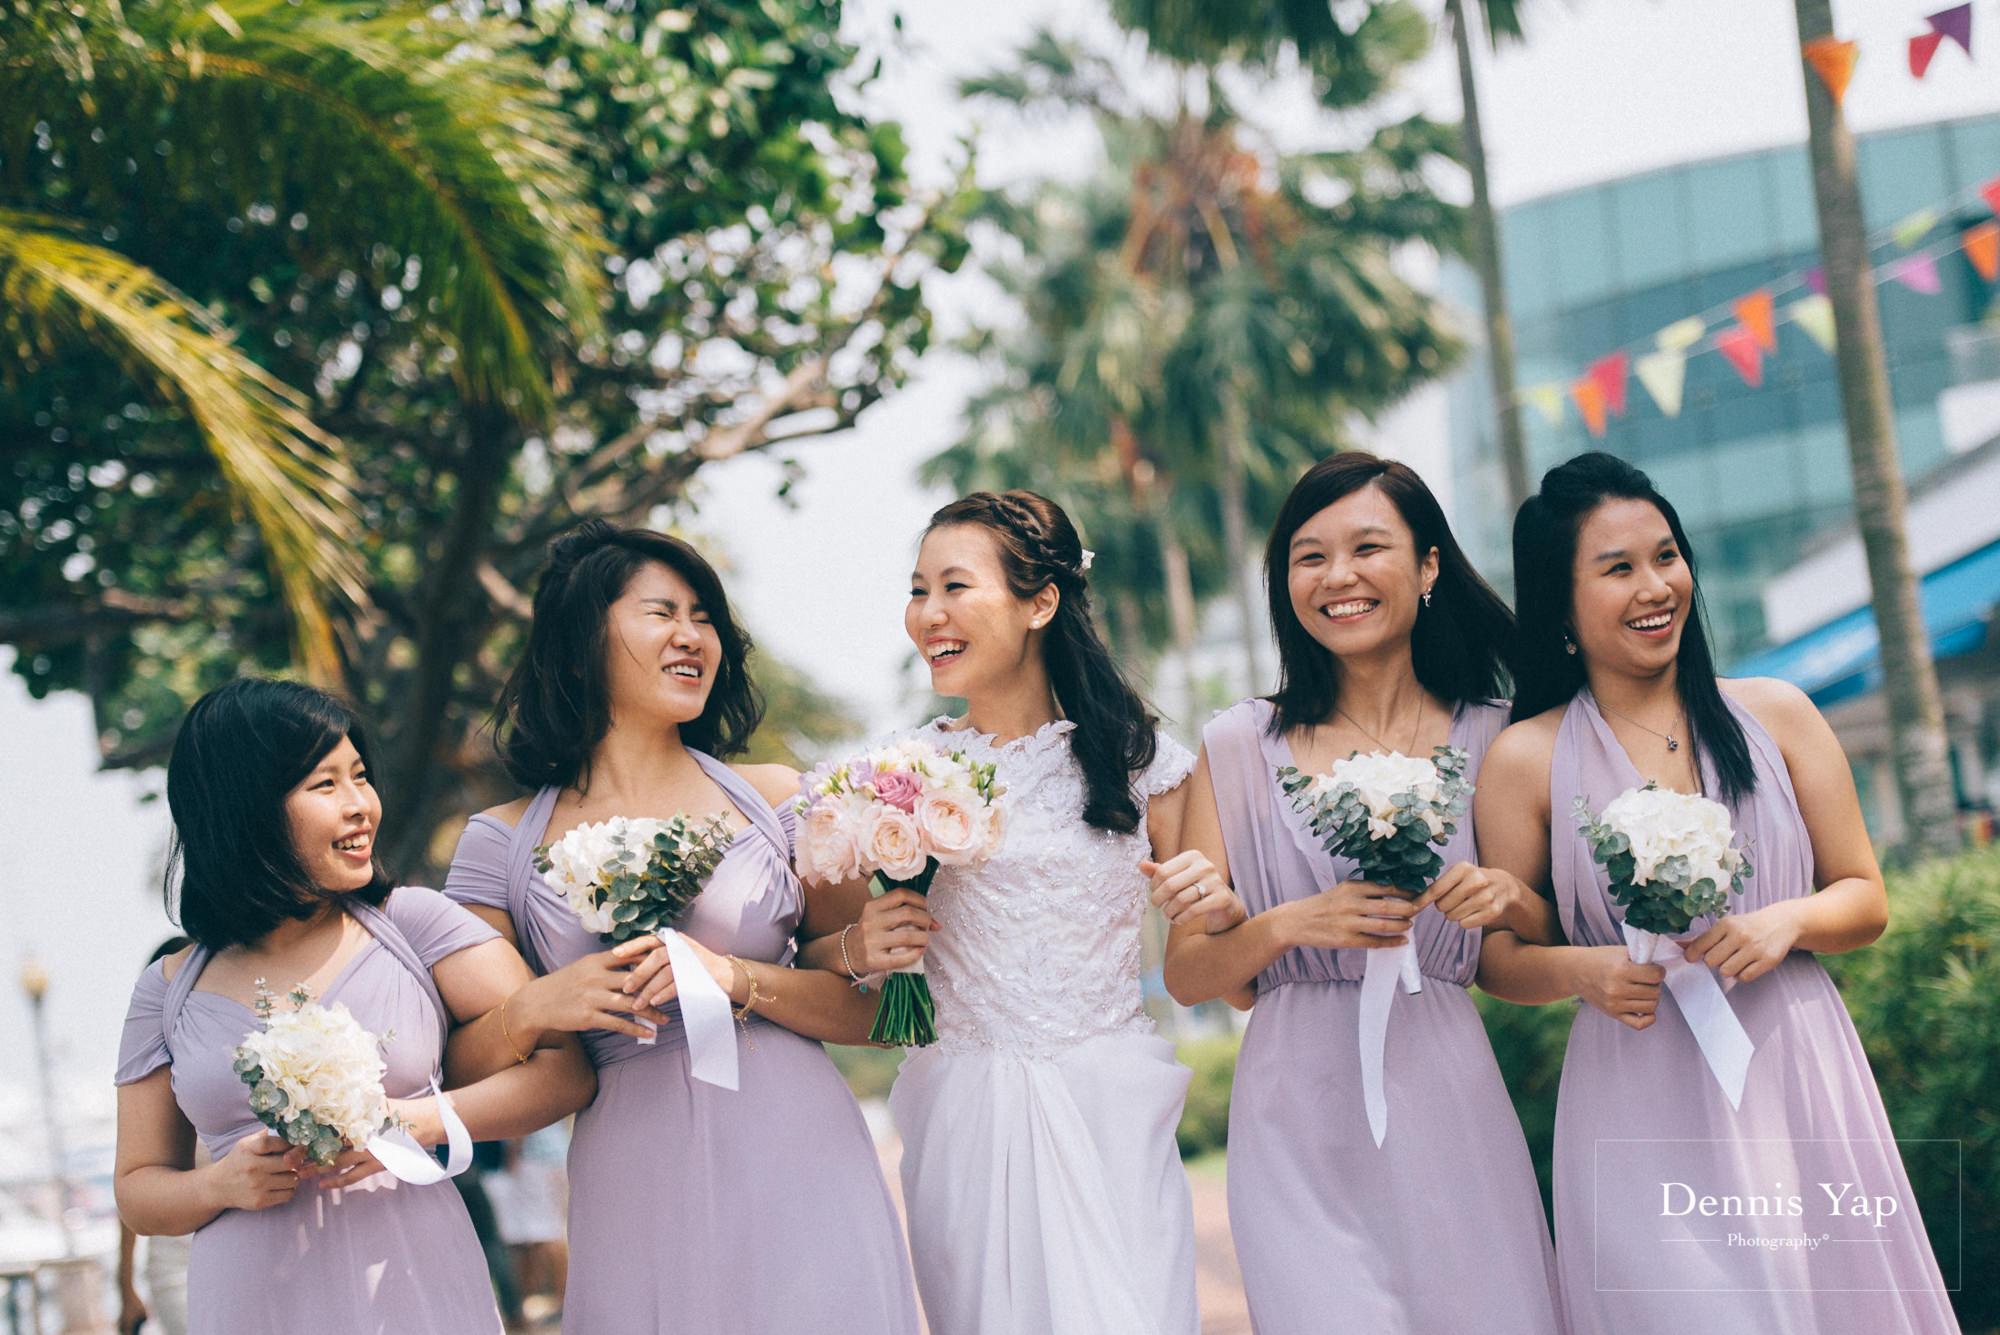 danny sherine wedding reception registration of marriage yacht fun beloved sea dennis yap photography malaysia top wedding photographer-15.jpg